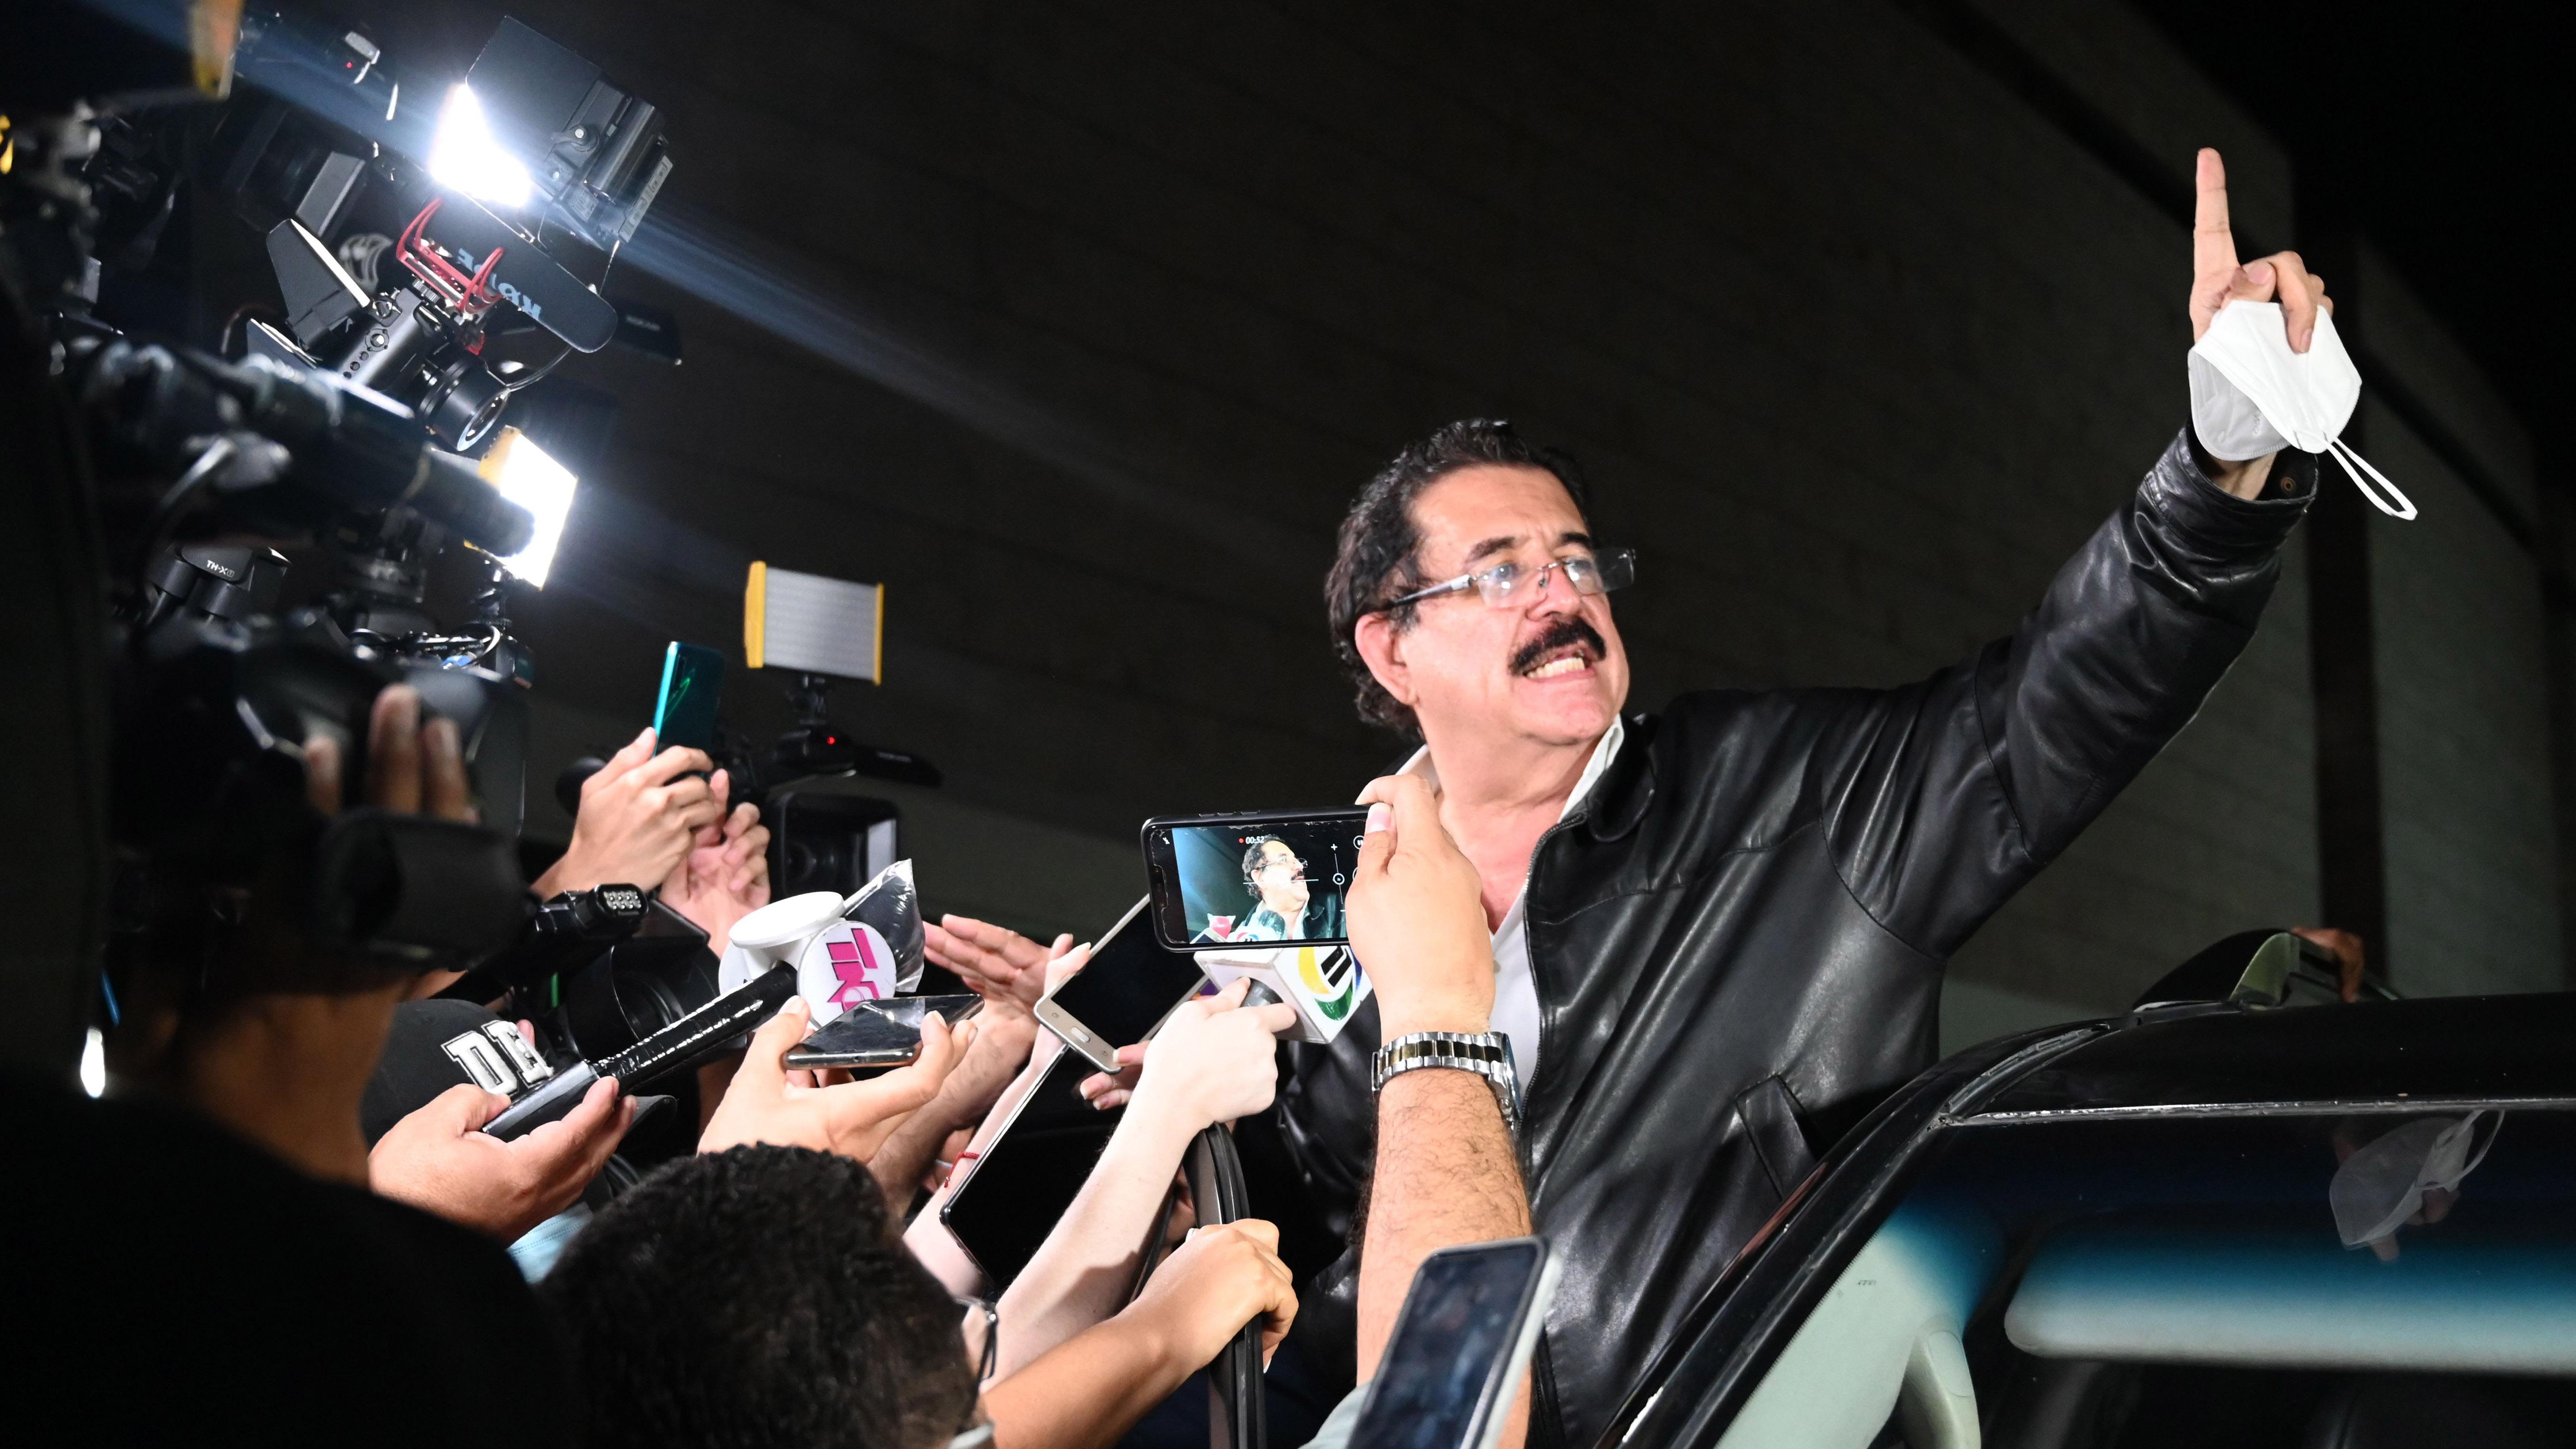 Maleta con miles de dólares: retienen a expresidente de Honduras por varias horas en aeropuerto